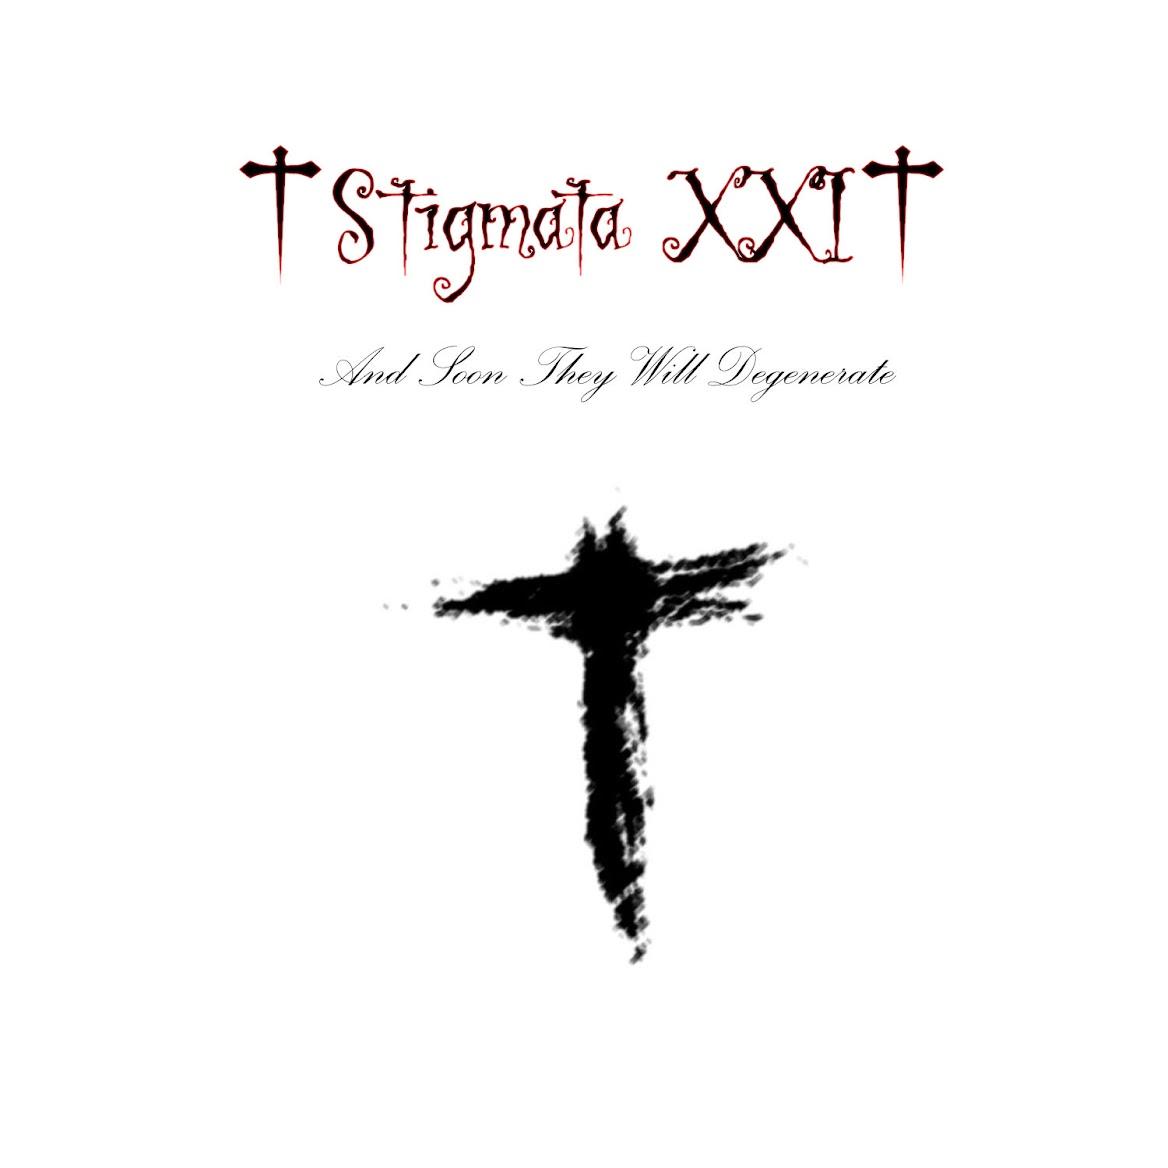 +Stigmata XXI+ The Official Cult